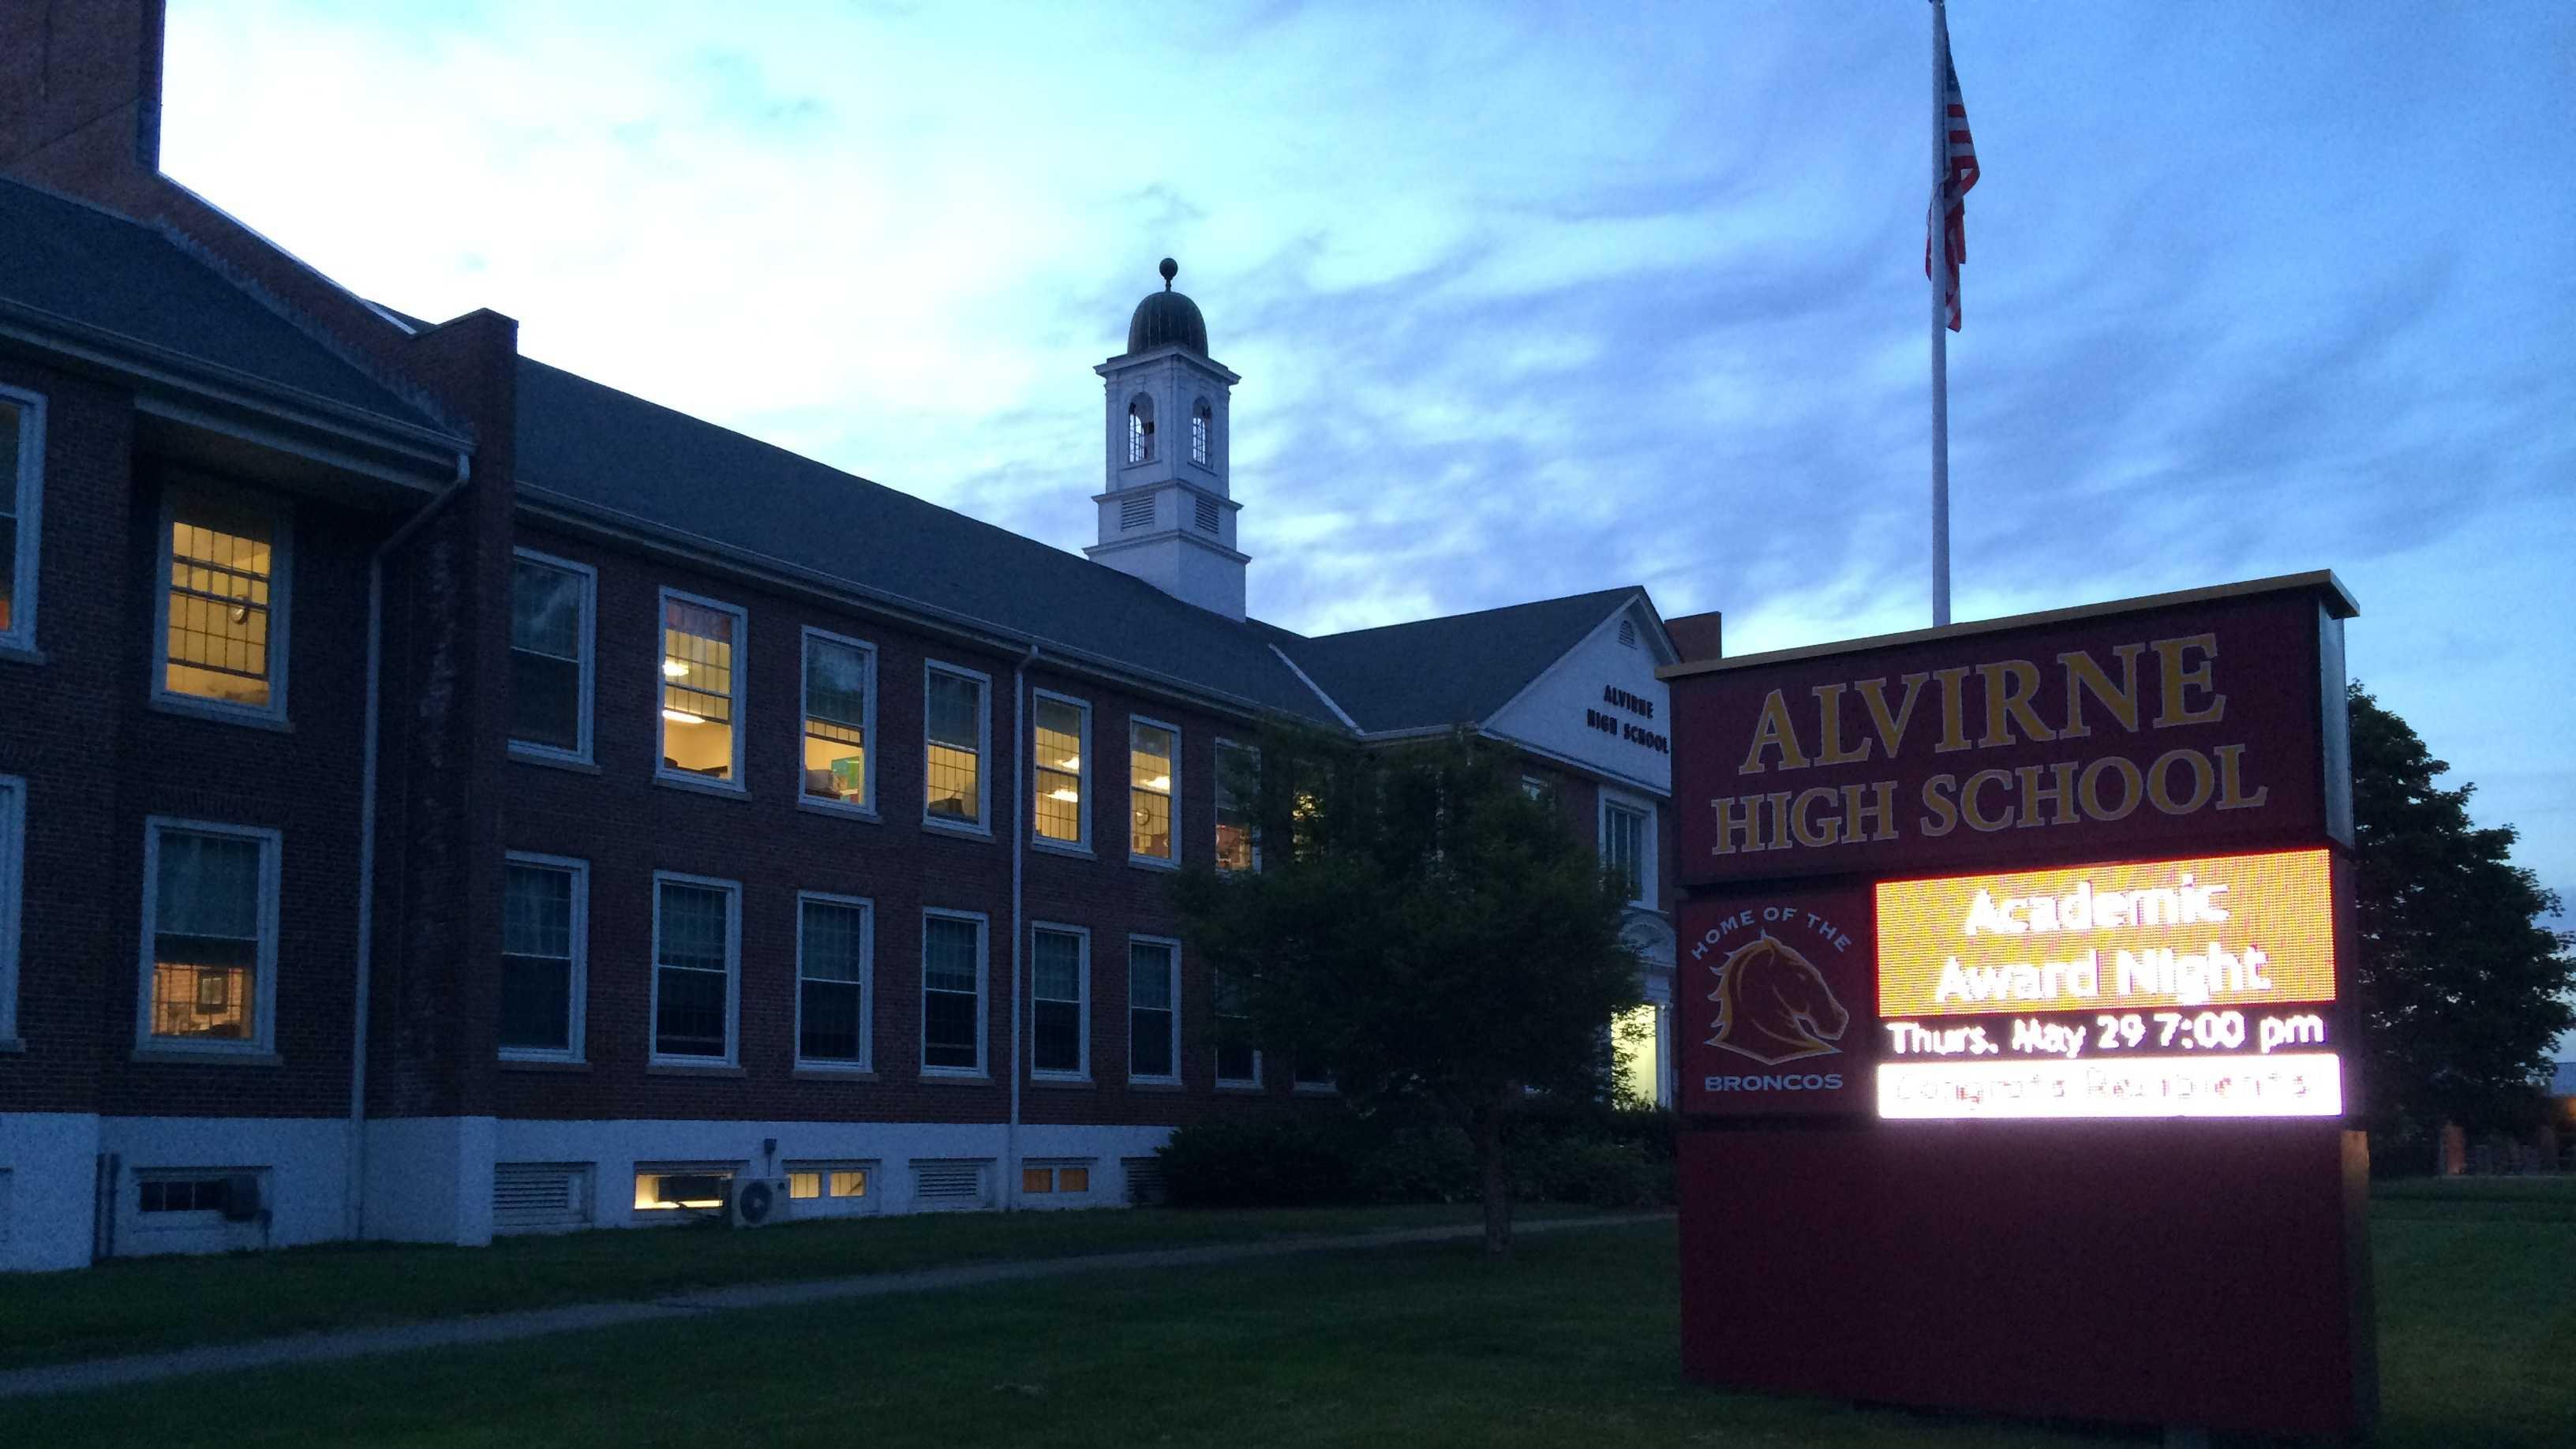 AlvirneHighSchool